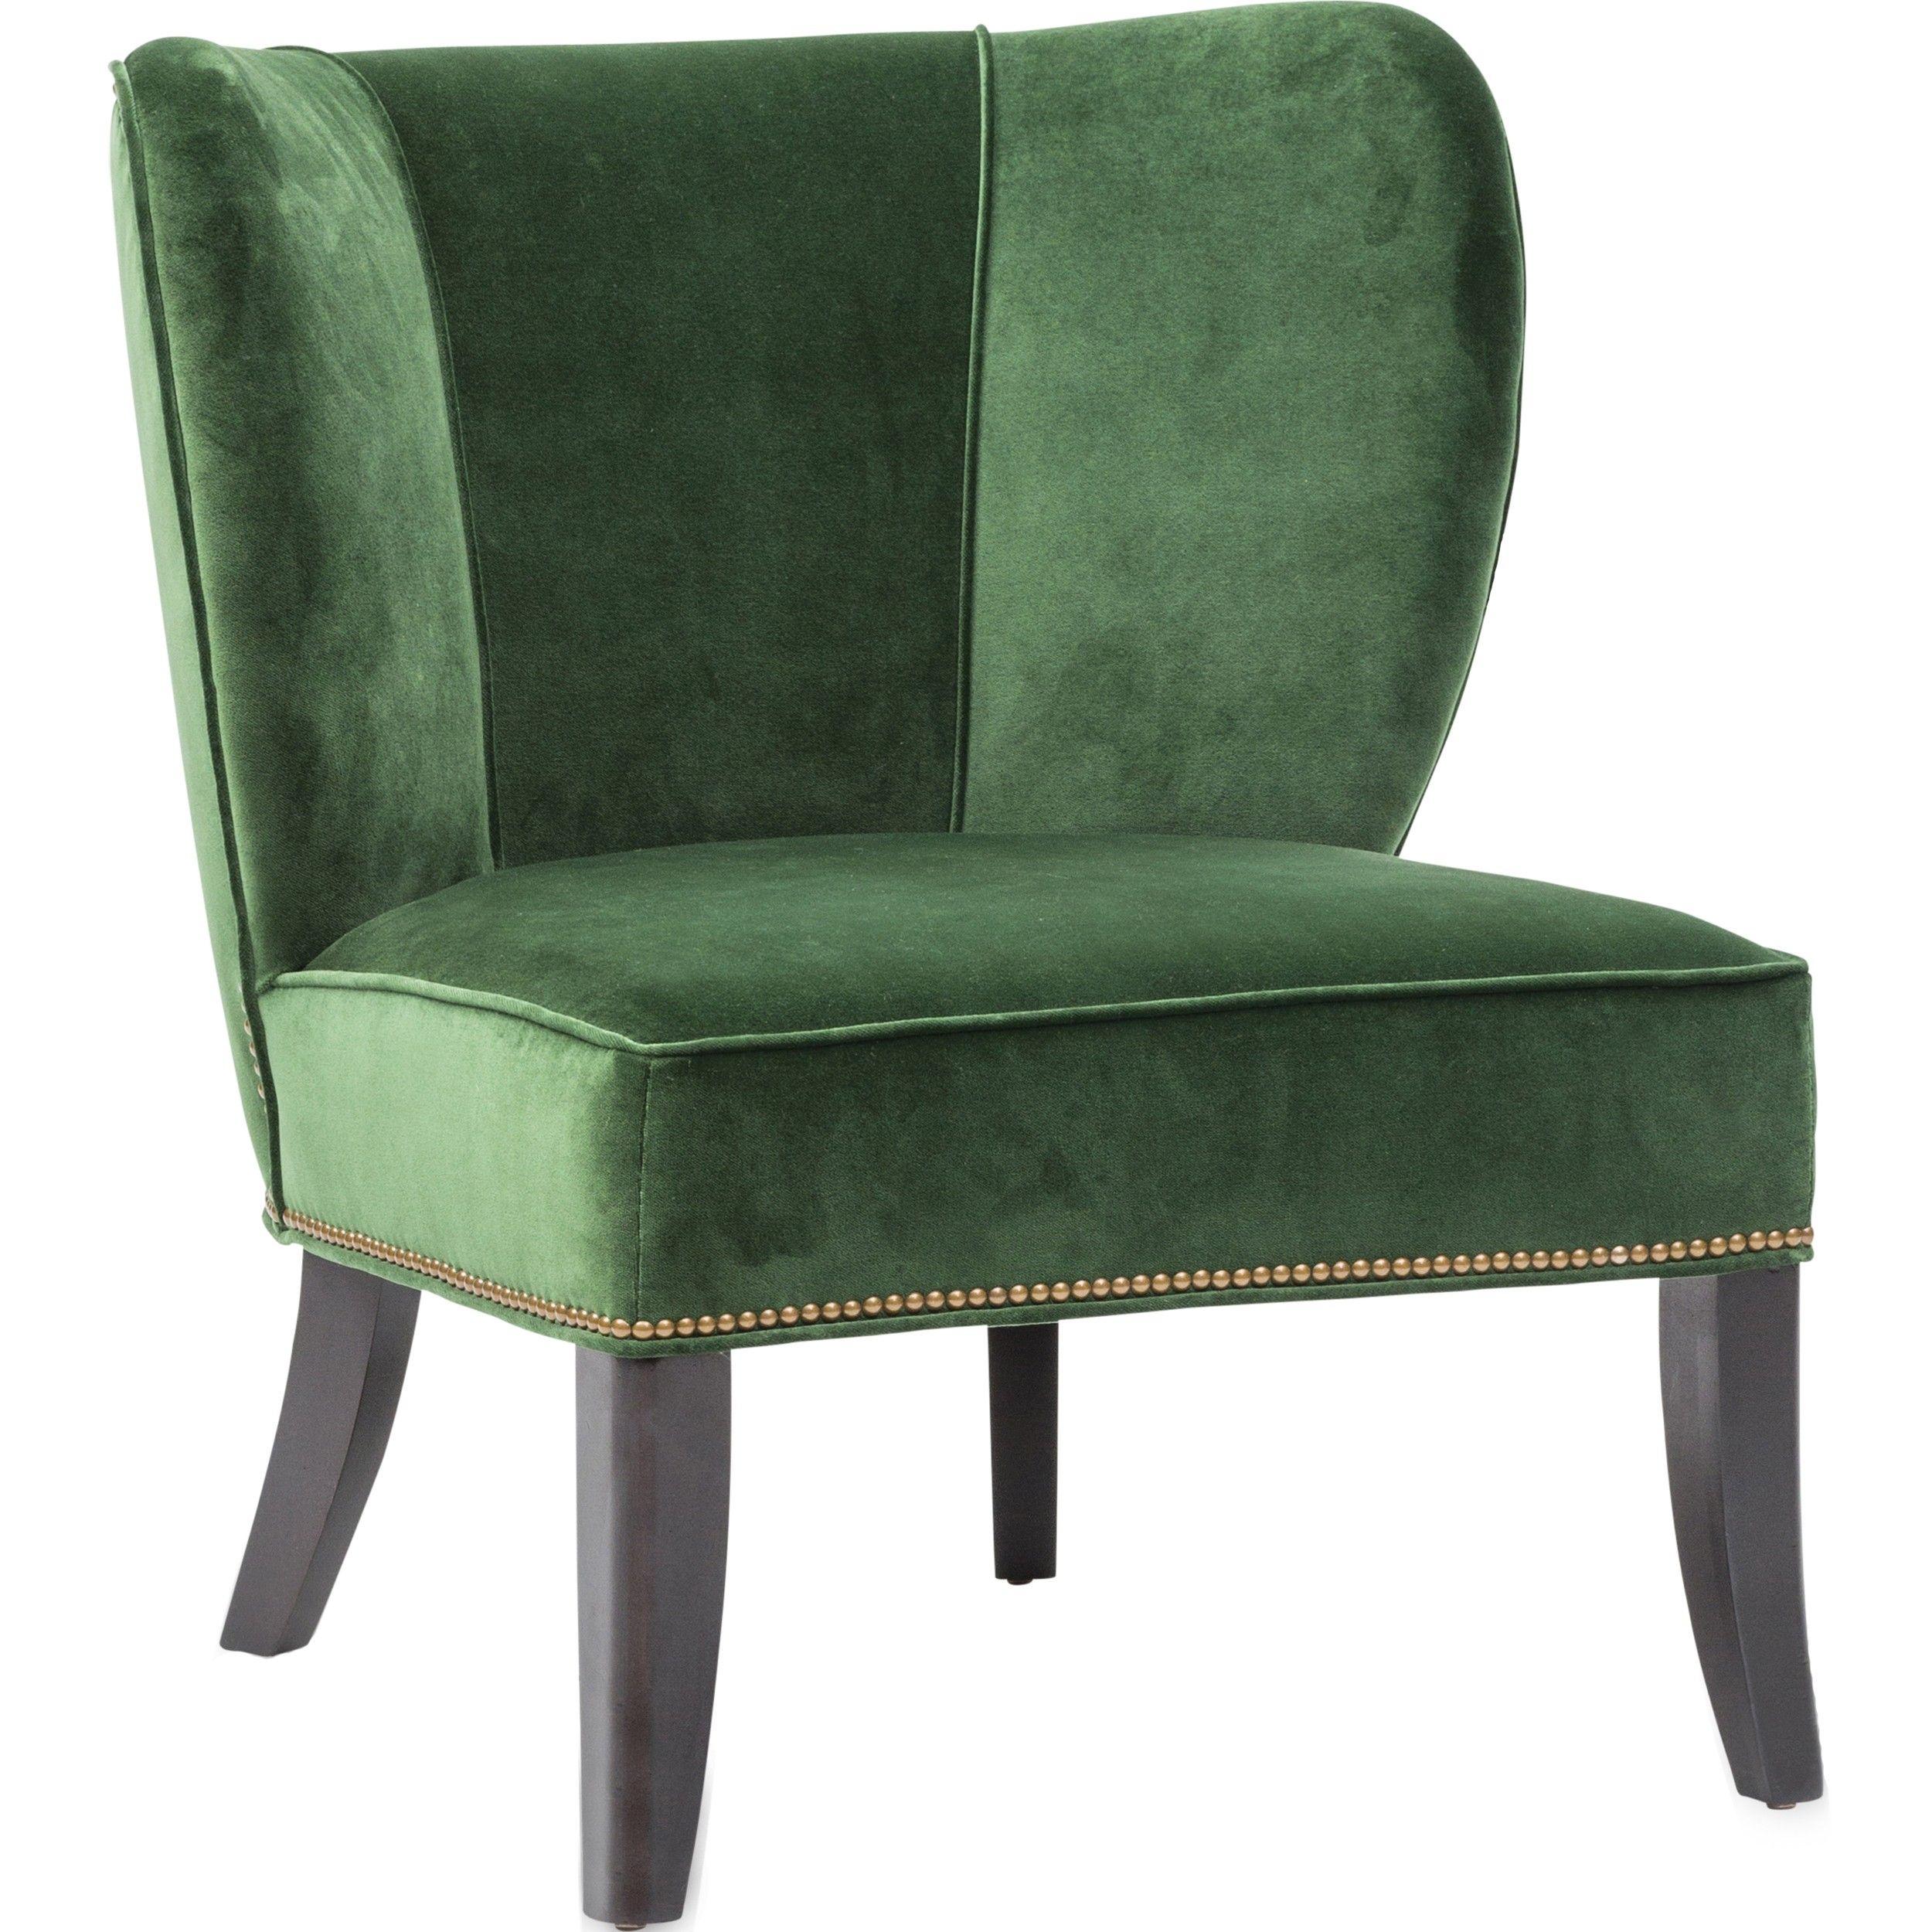 Annie Chair Vance Emerald  Furniture  Chairs  Fabric